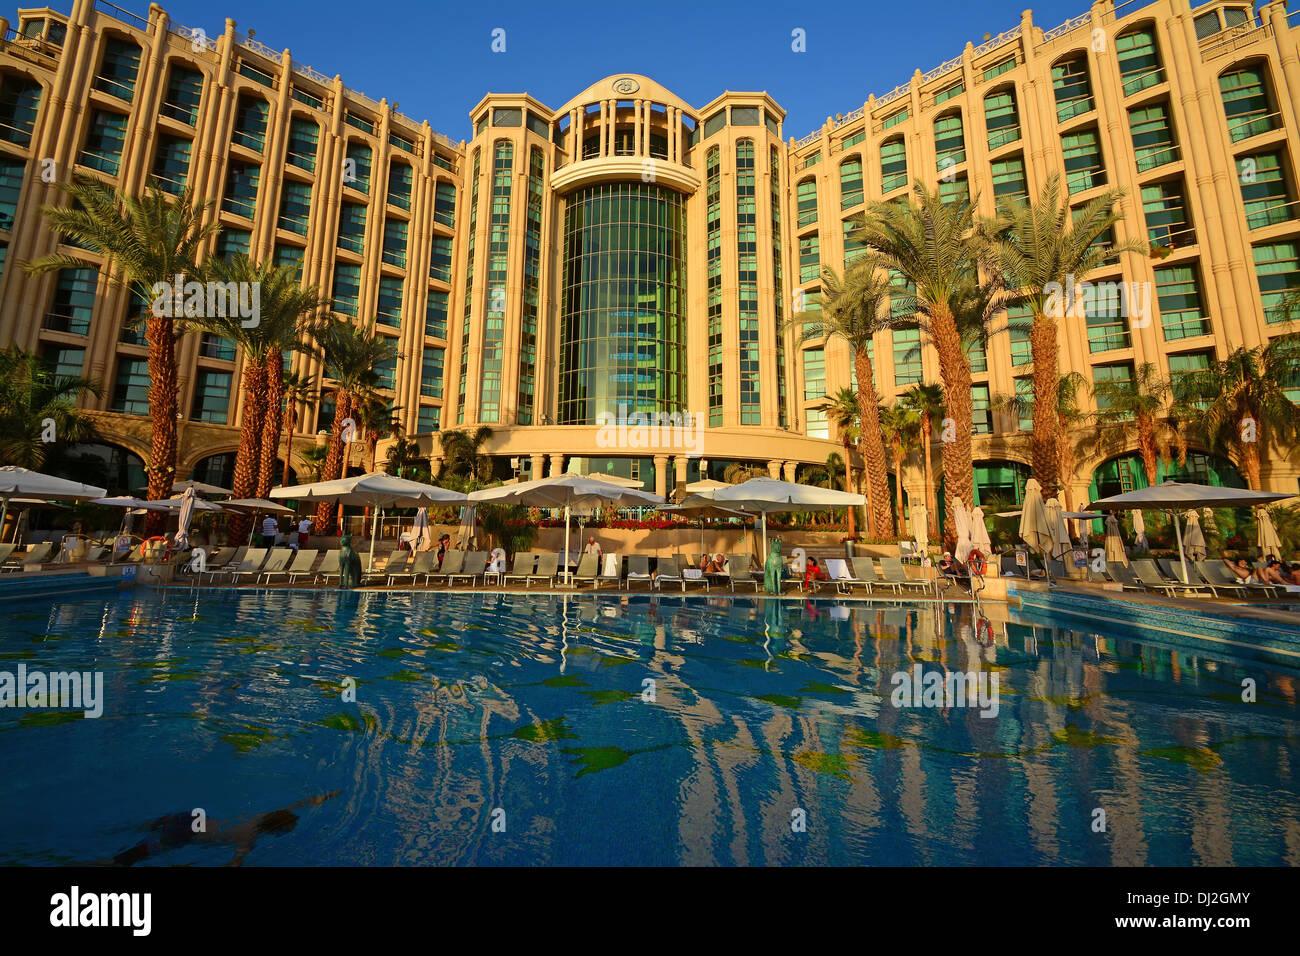 Hilton, Queen of Sheba Hotel, Eilat, Israel, - Stock Image